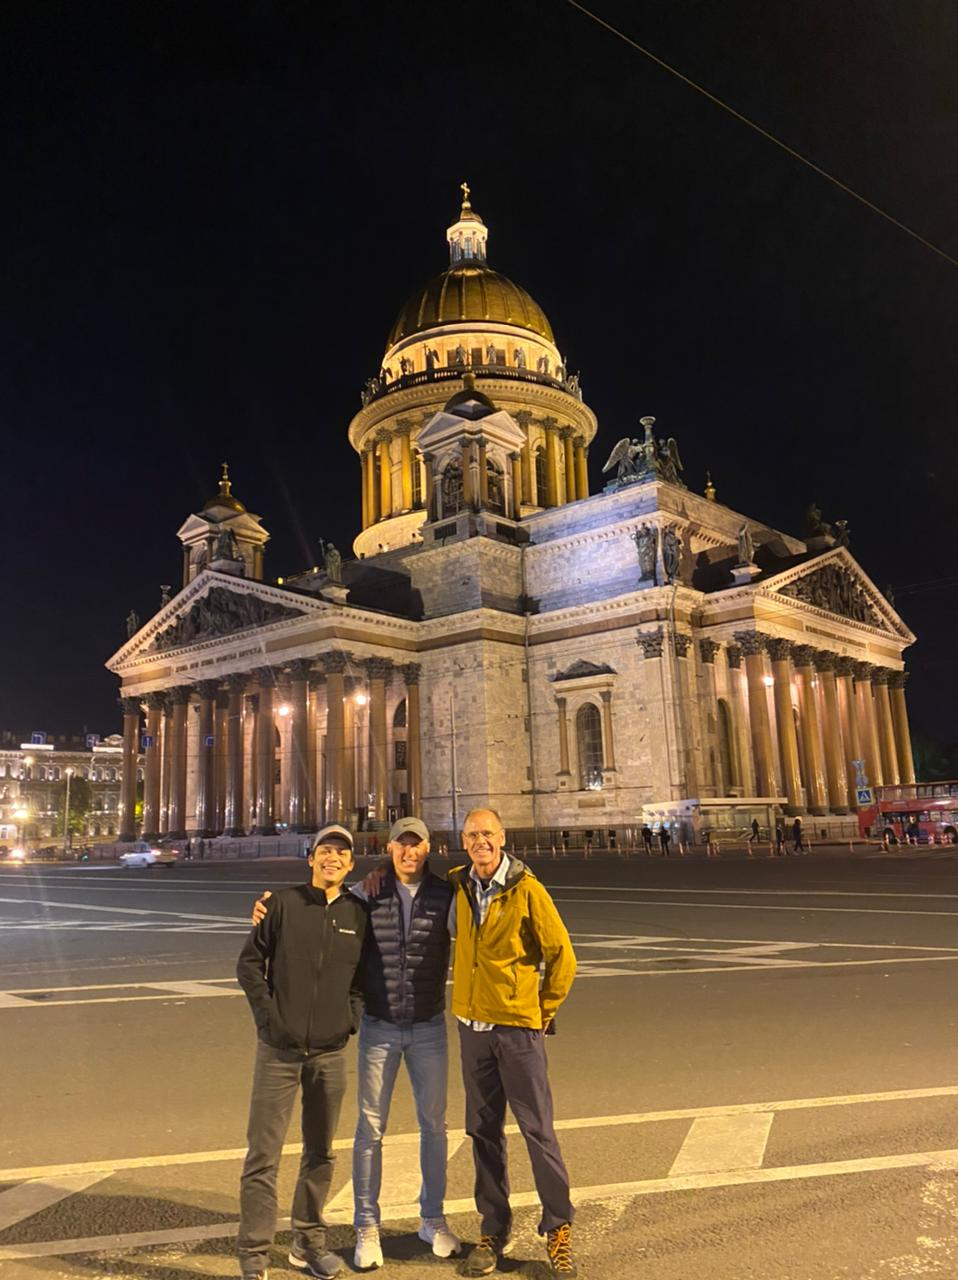 Elbrus 2021 Team in front of St Isaac's Cathedral (Sasha Sak)